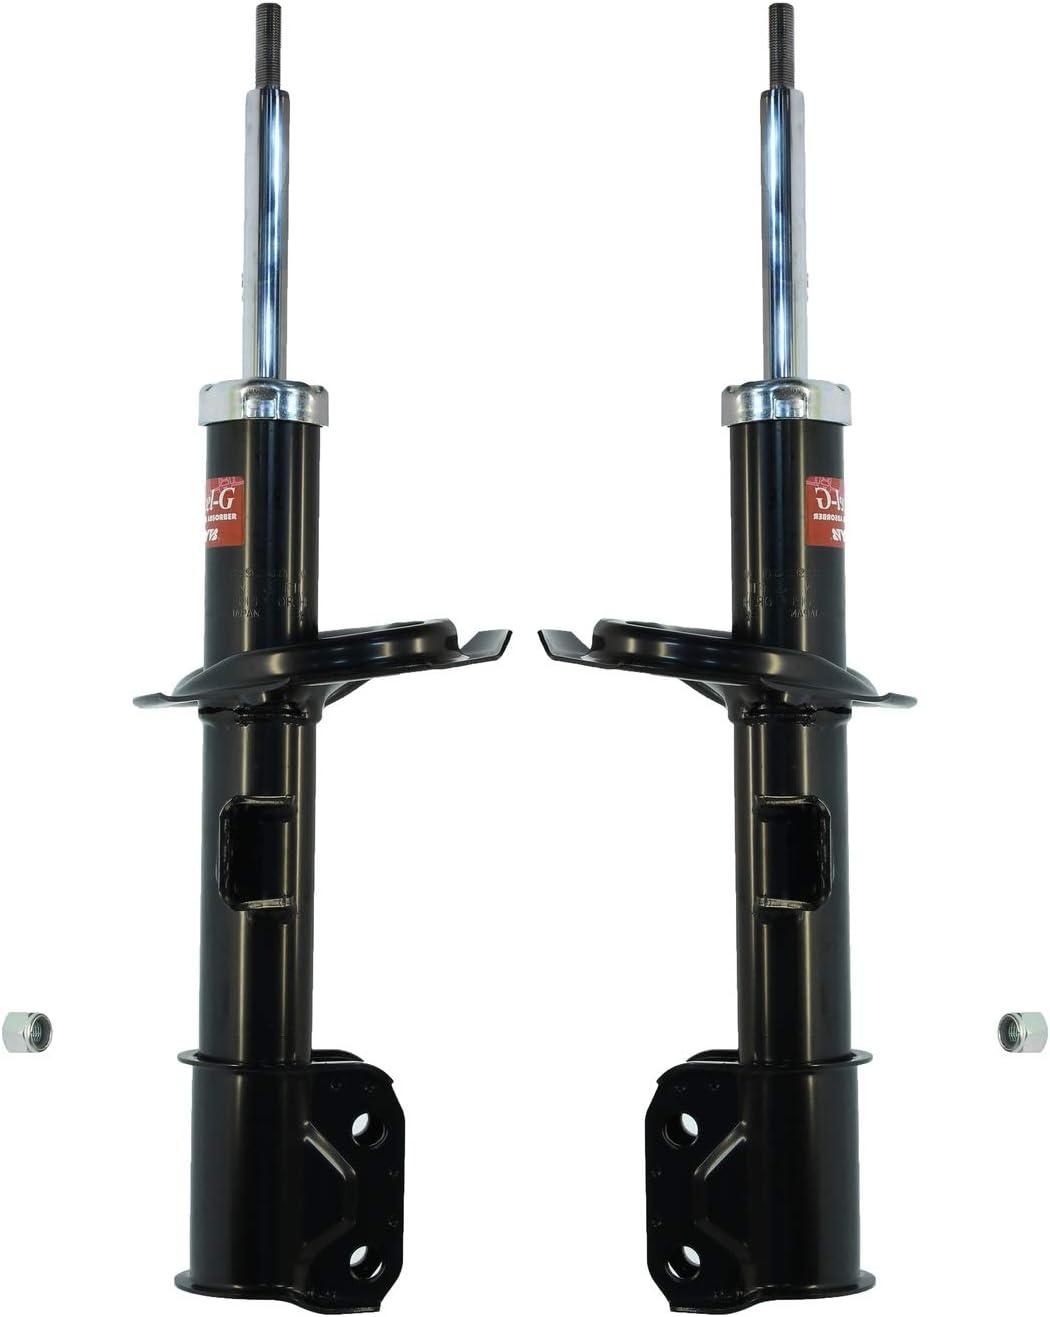 Pair Set of 2 Front Excel-G KYB Suspension Struts for Suzuki Kizashi 2010-2013